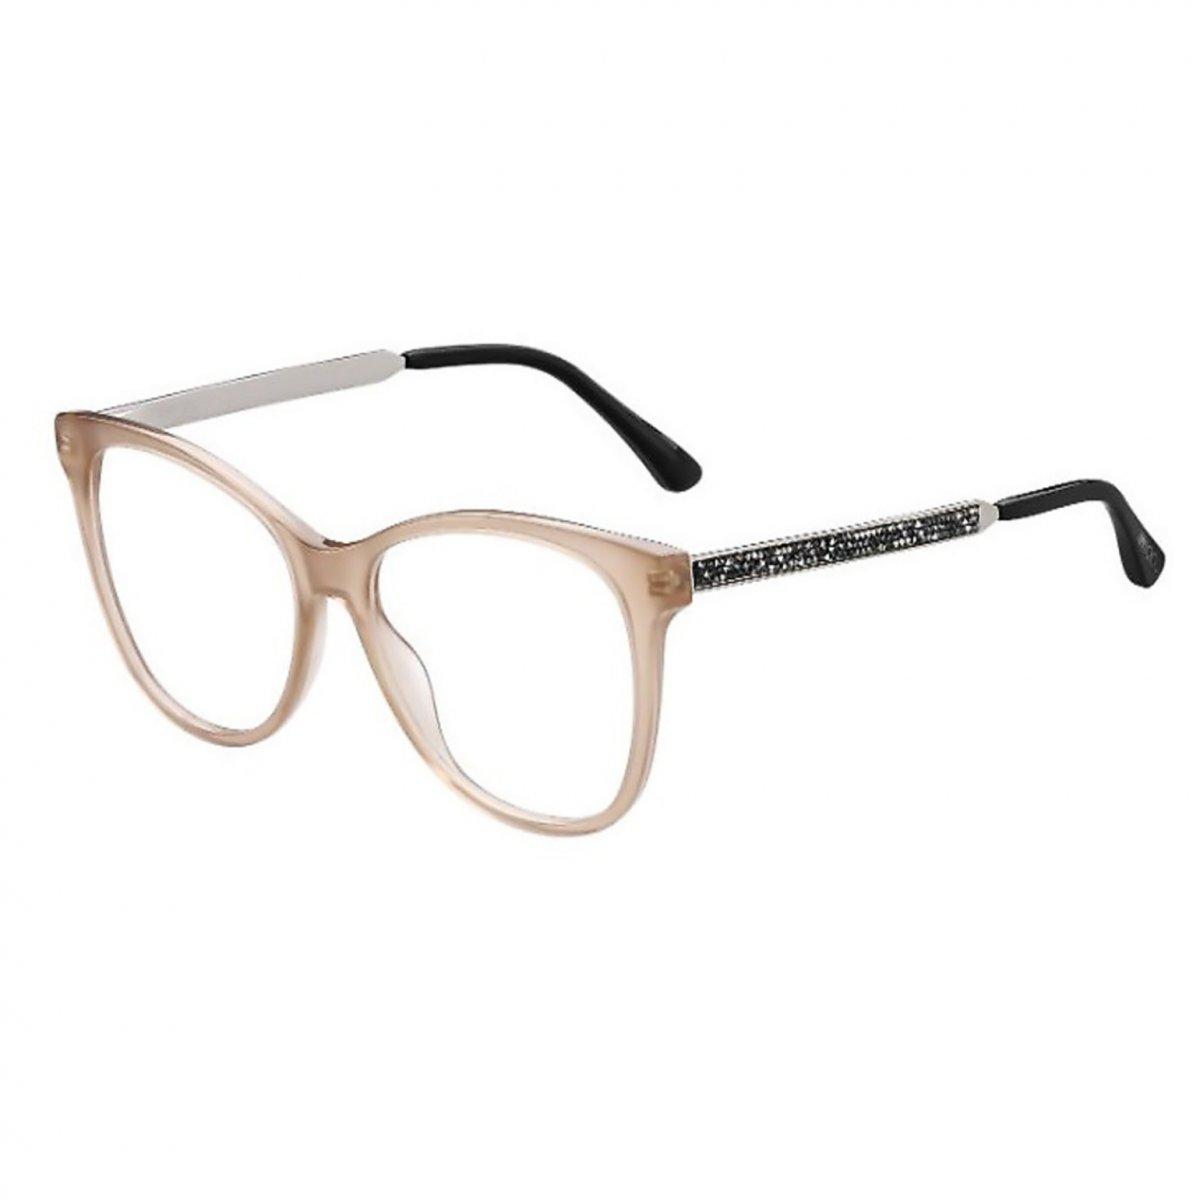 1984058d921e4 Óculos de Grau Feminino Jimmy Choo